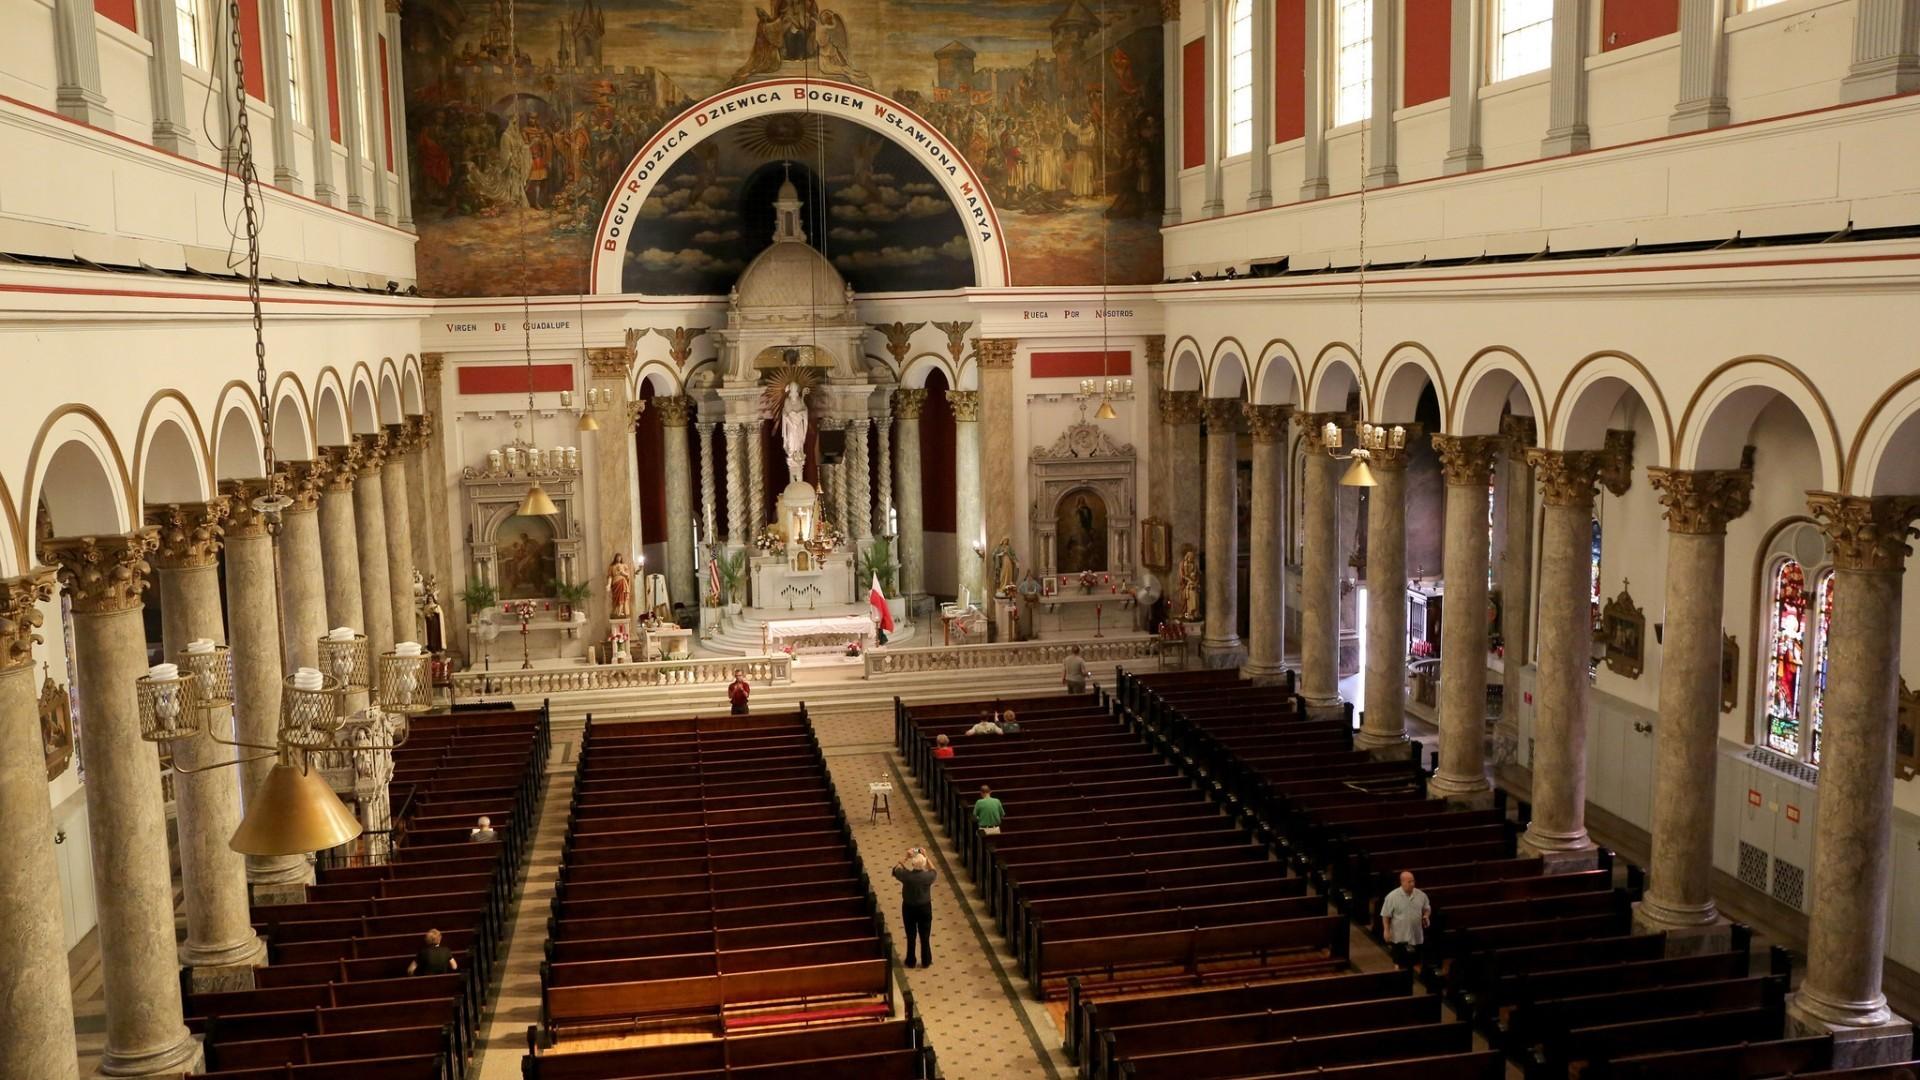 st adalbert church may be for sale chicago tribune. Black Bedroom Furniture Sets. Home Design Ideas